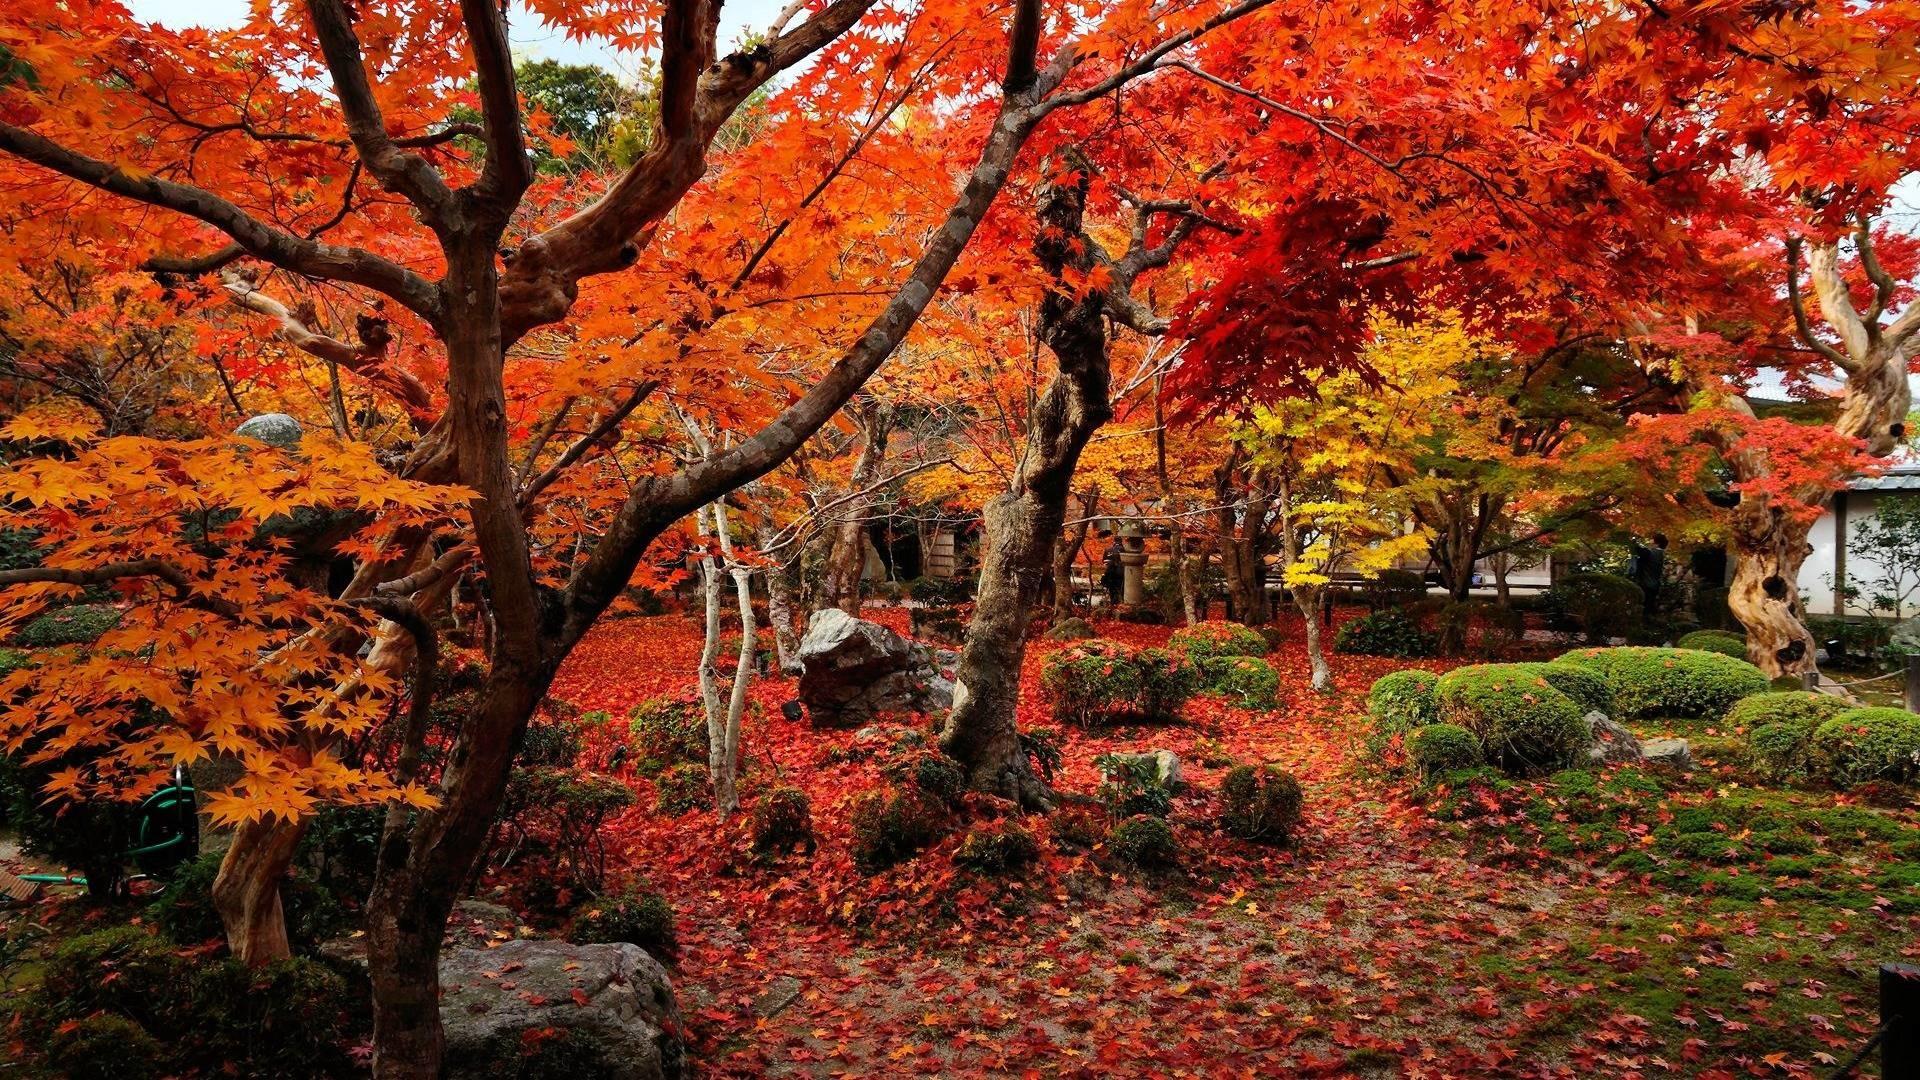 Wallpaper autumn wallpapers temple enkoji colorful world .